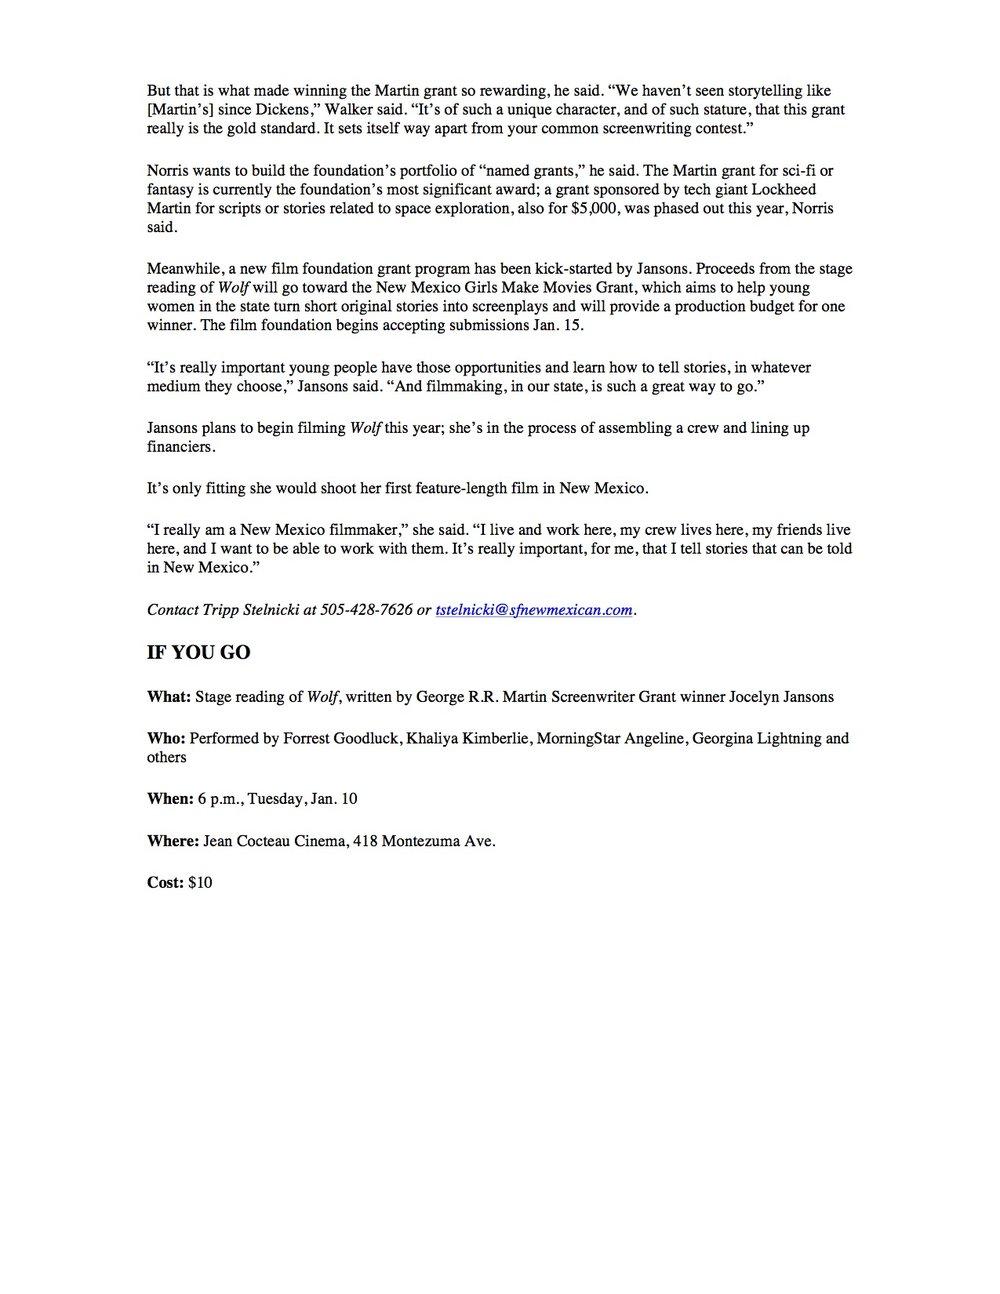 Jansons Recent Press Wolf 3.jpg